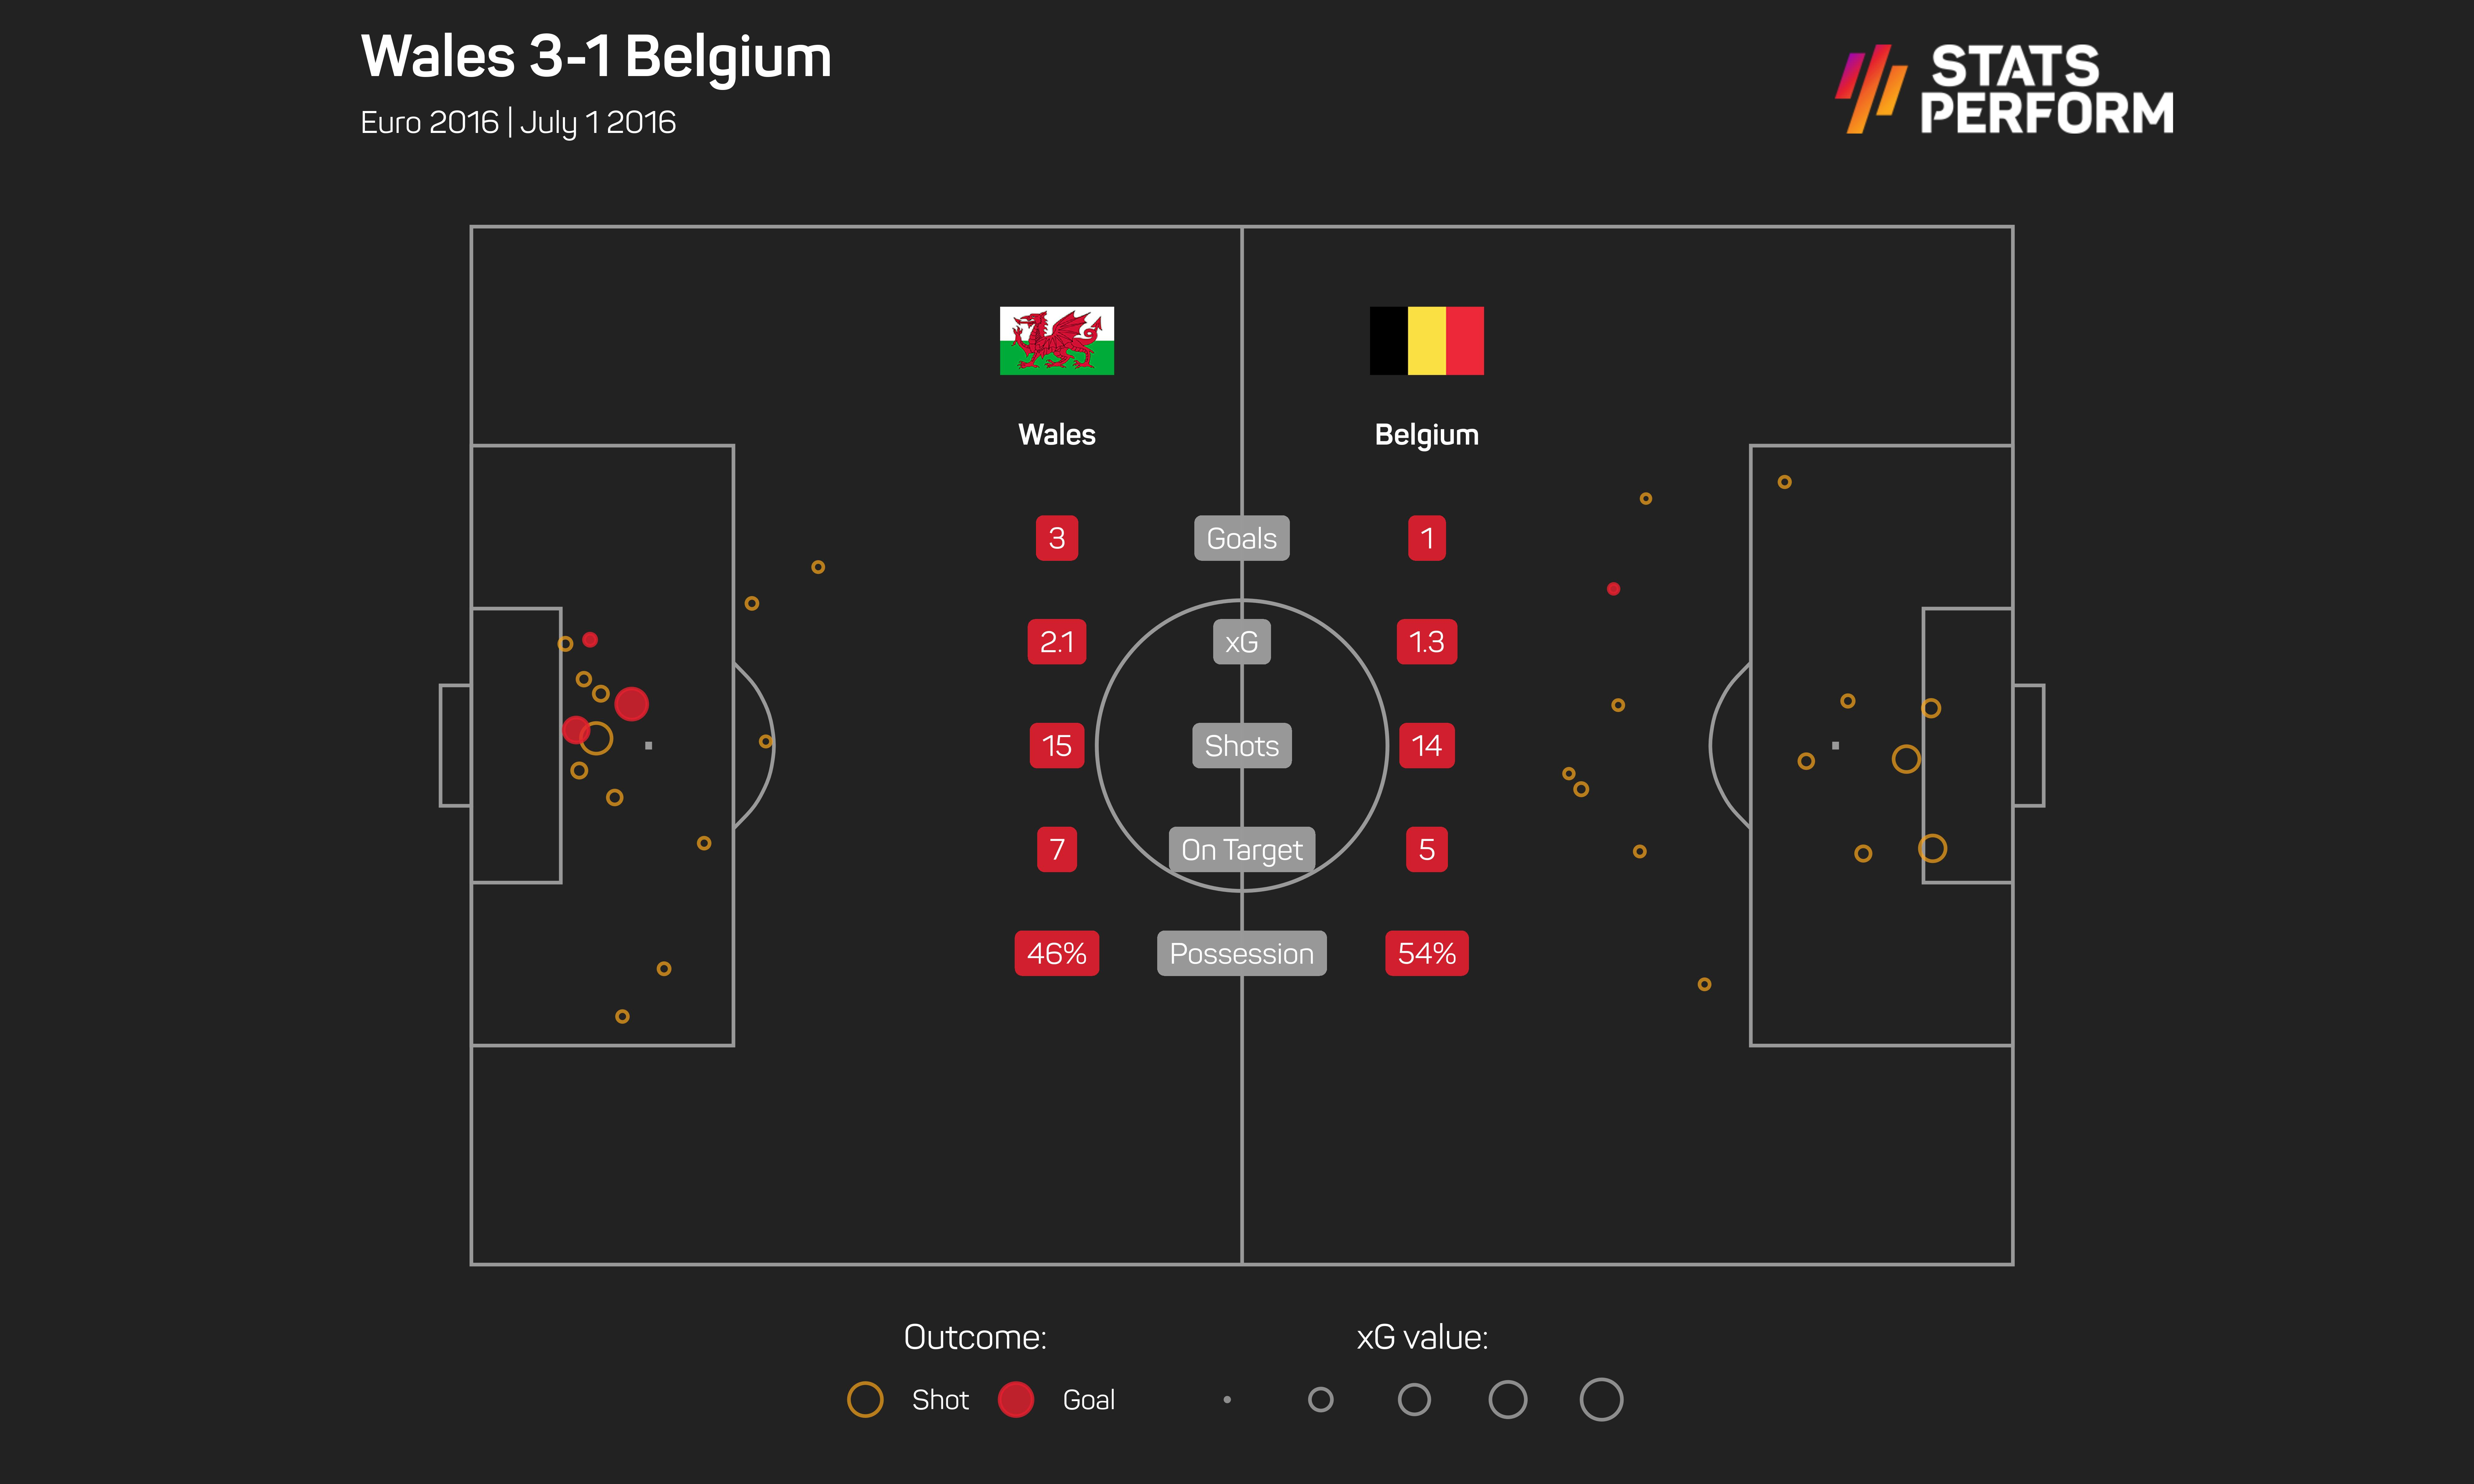 Wales 3-1 Belgium xG